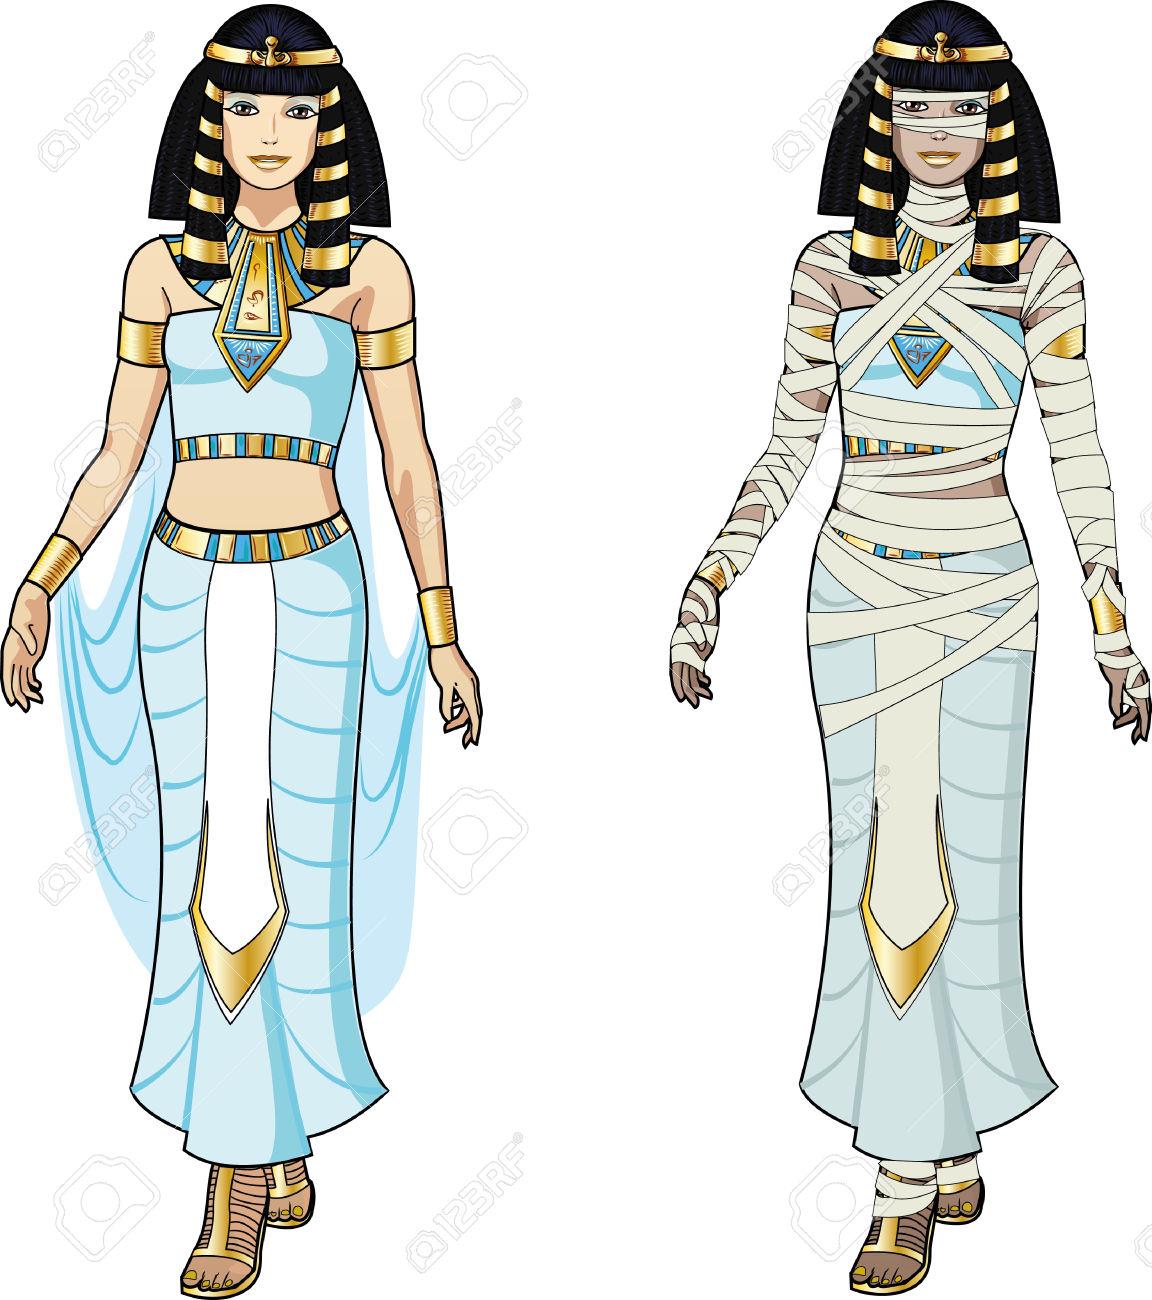 Egyptian mummy clipart image